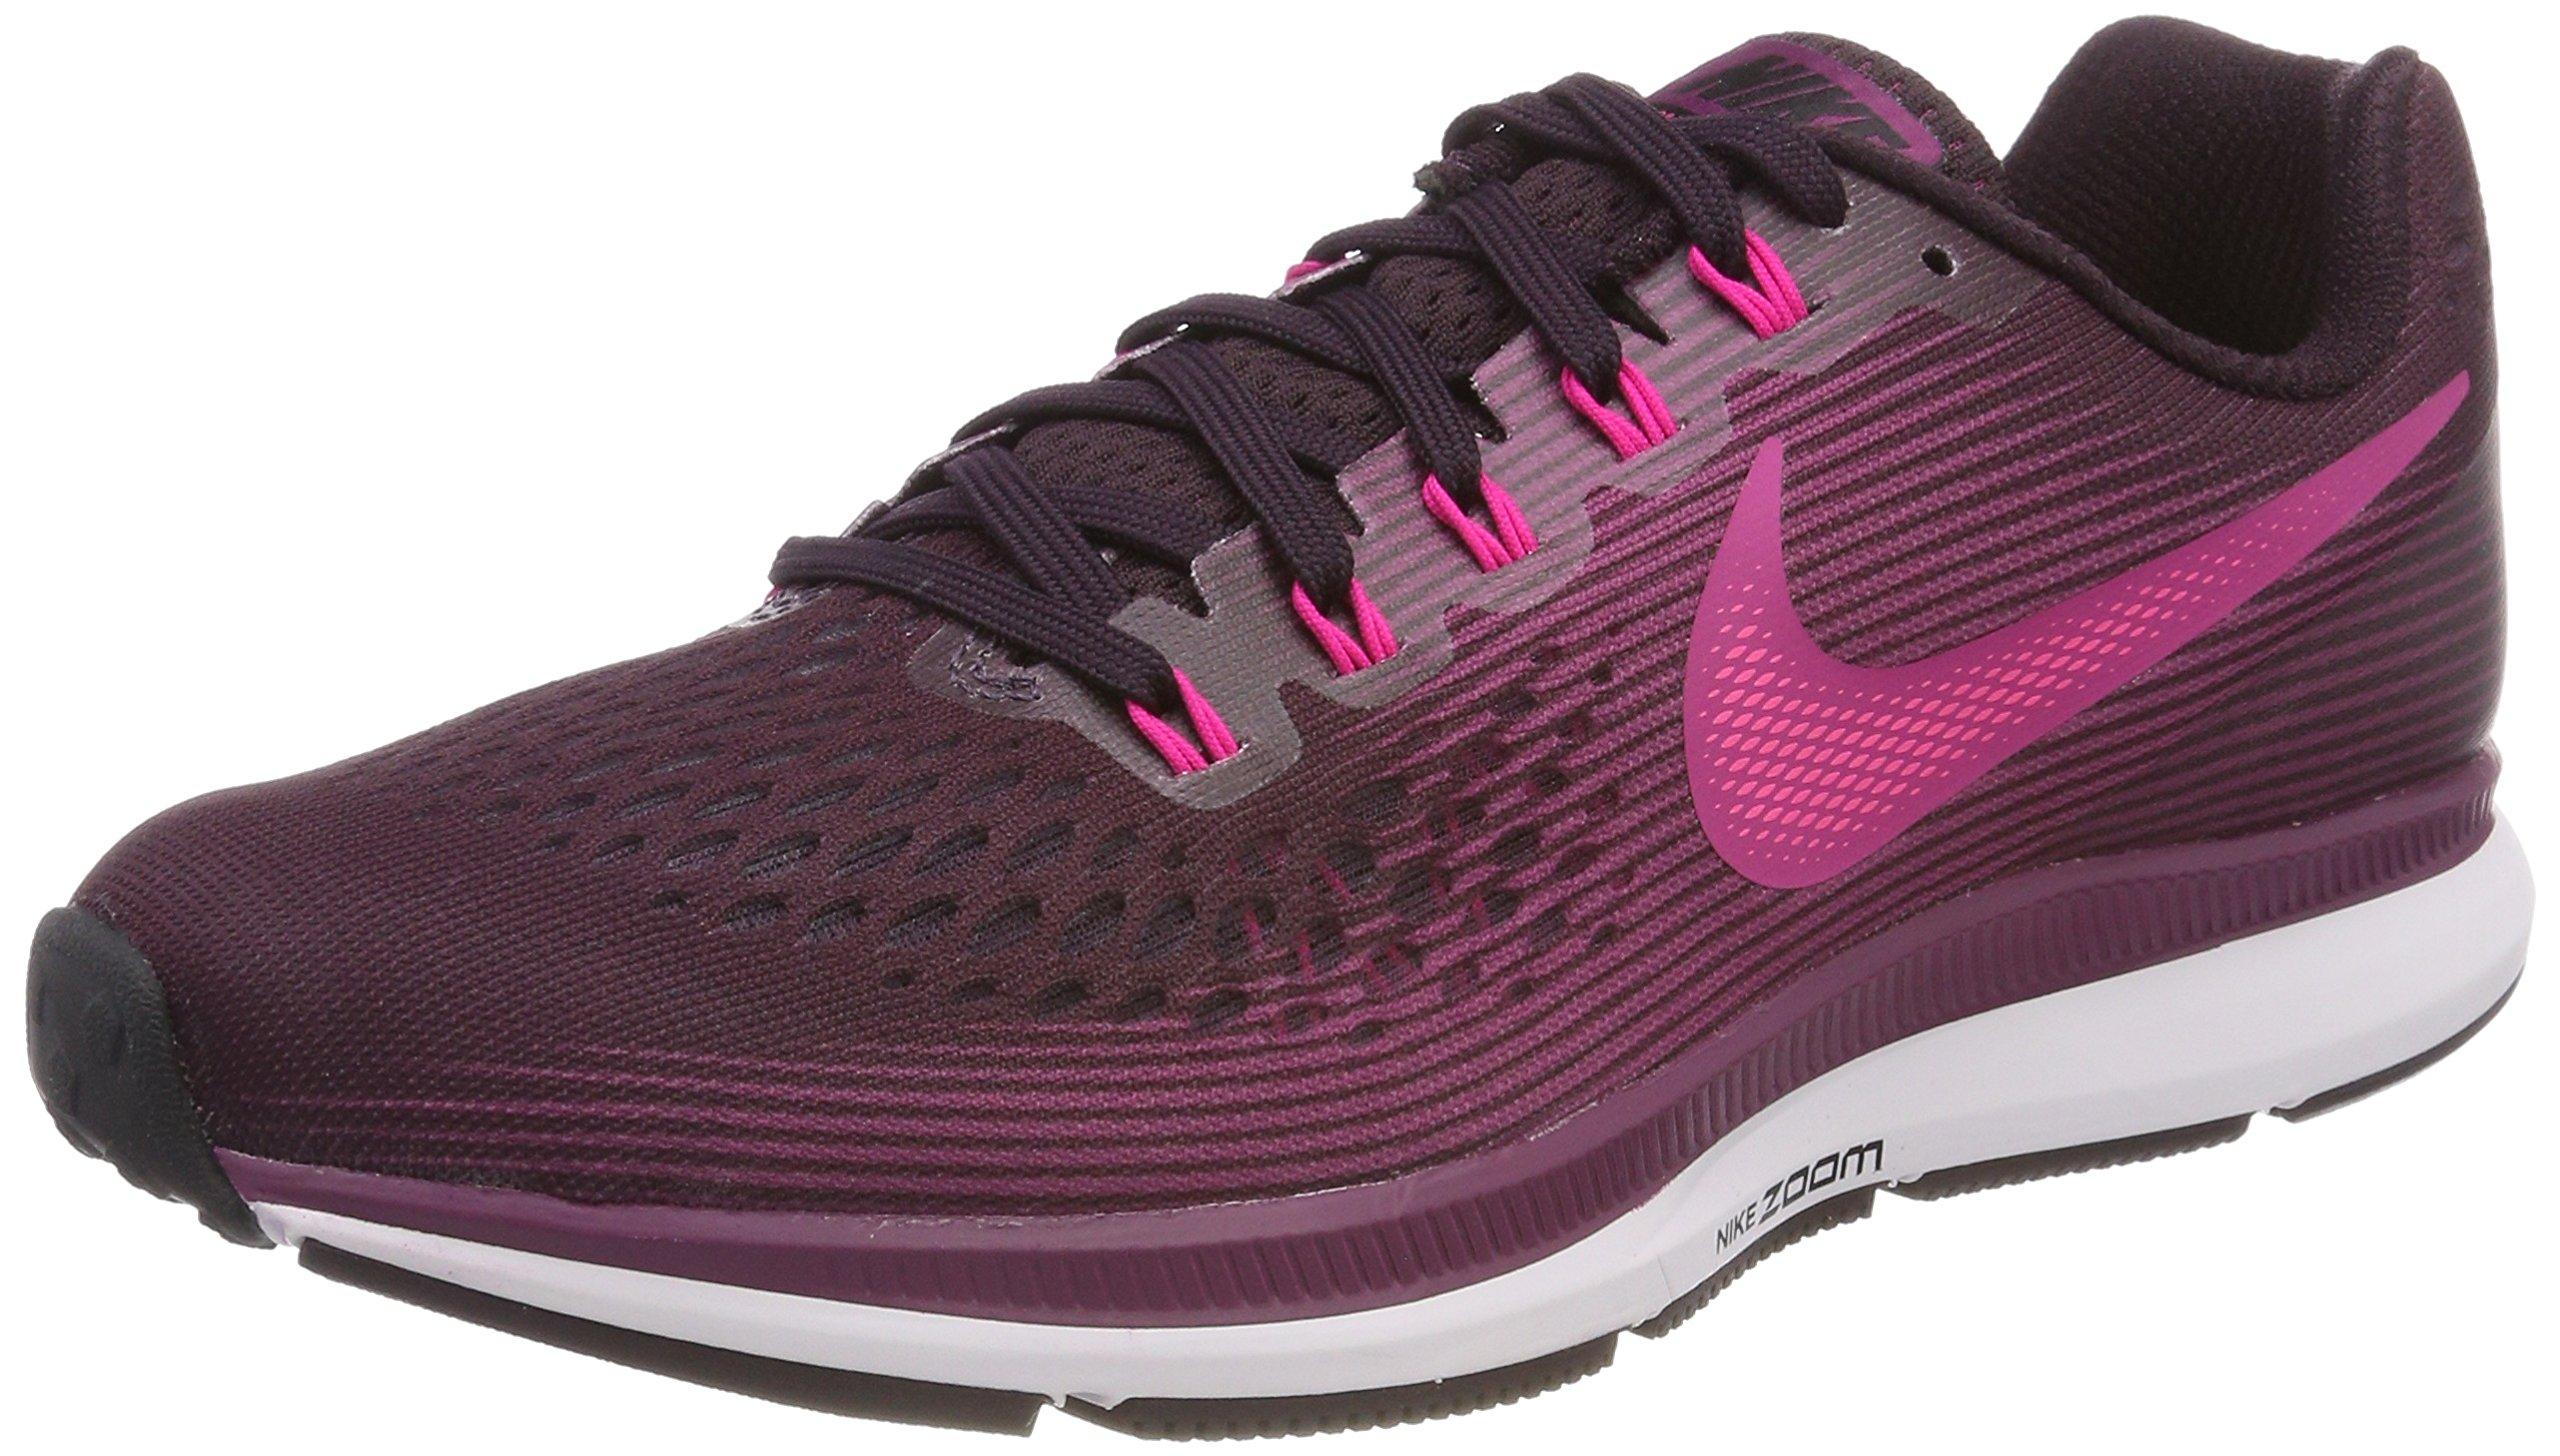 Nike Women's Air Zoom Pegasus 34 Running Shoe Port Wine/Deadly Pink/Tea Berry/Black Size 9 M US